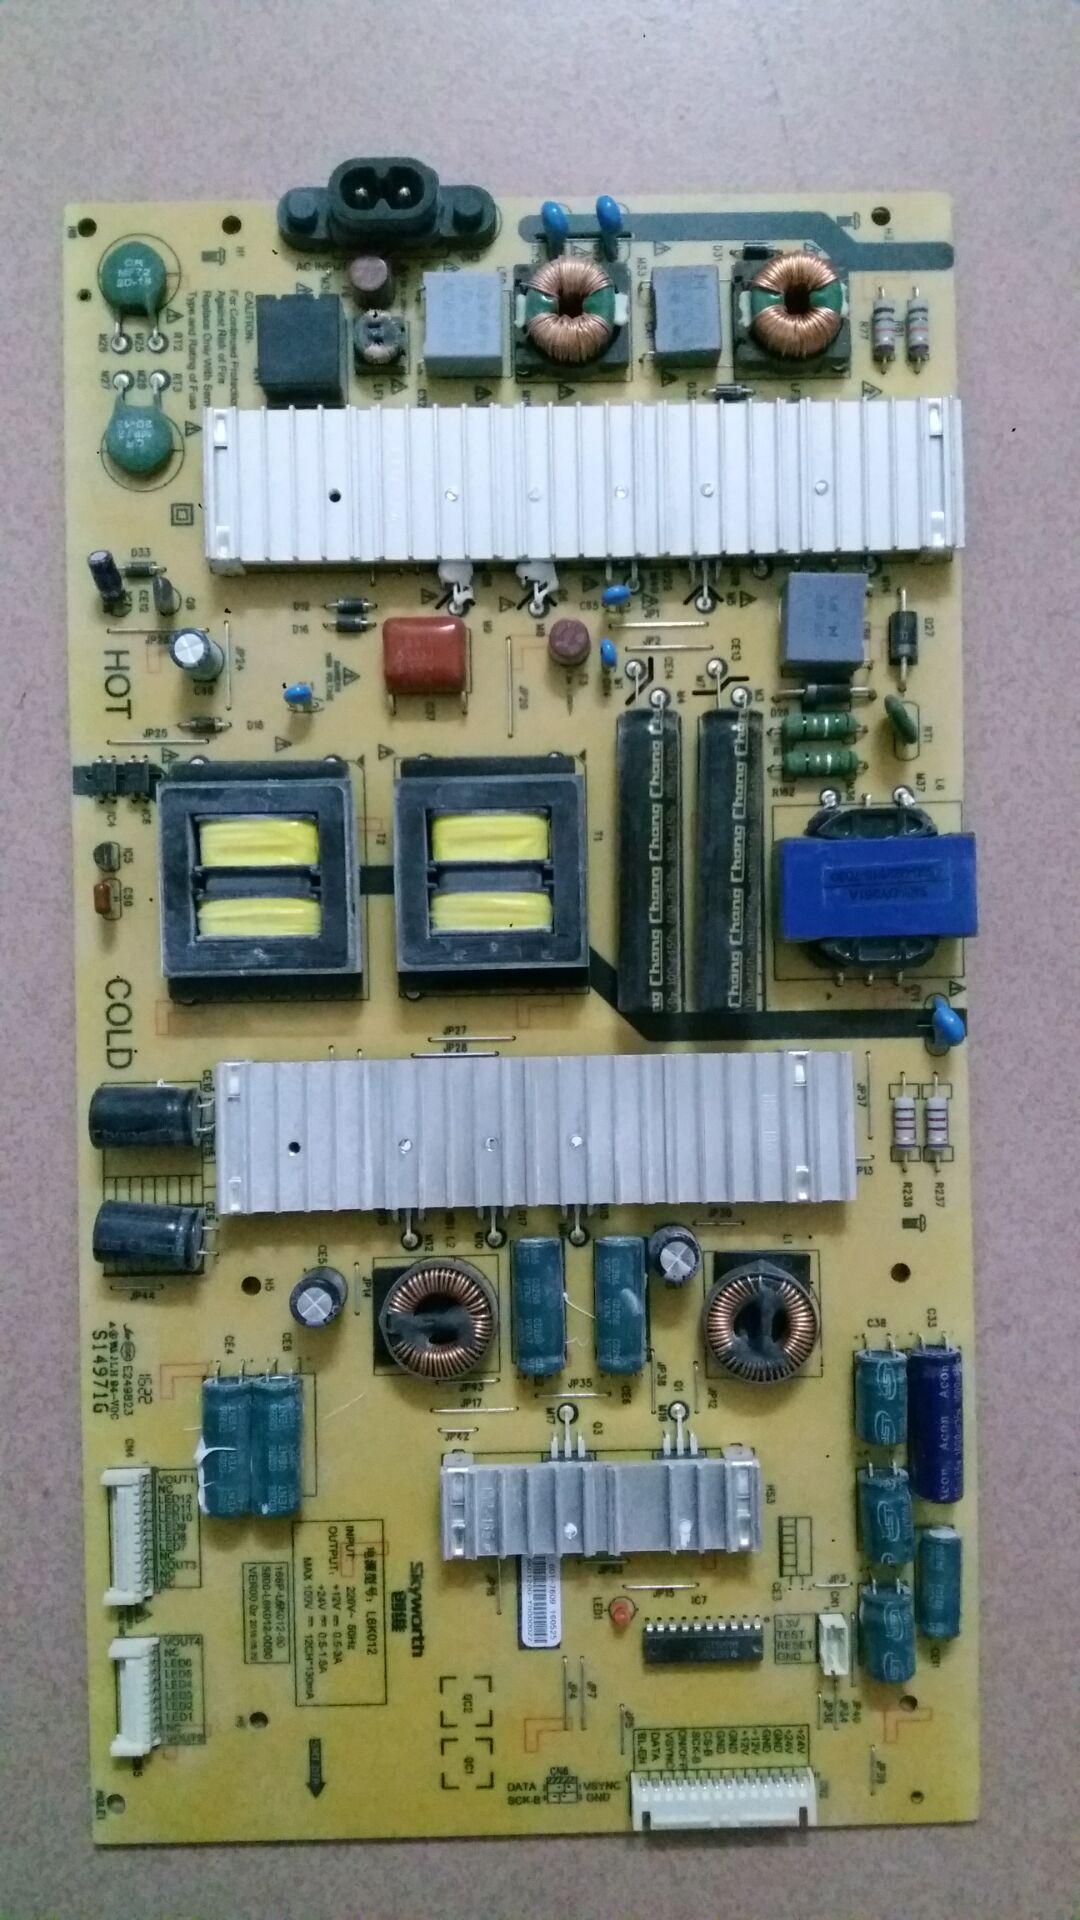 Skyworth LCD TV originele reserveonderdelen stroomaansluiting 5800-L6K012-0000168P-L6K012-00